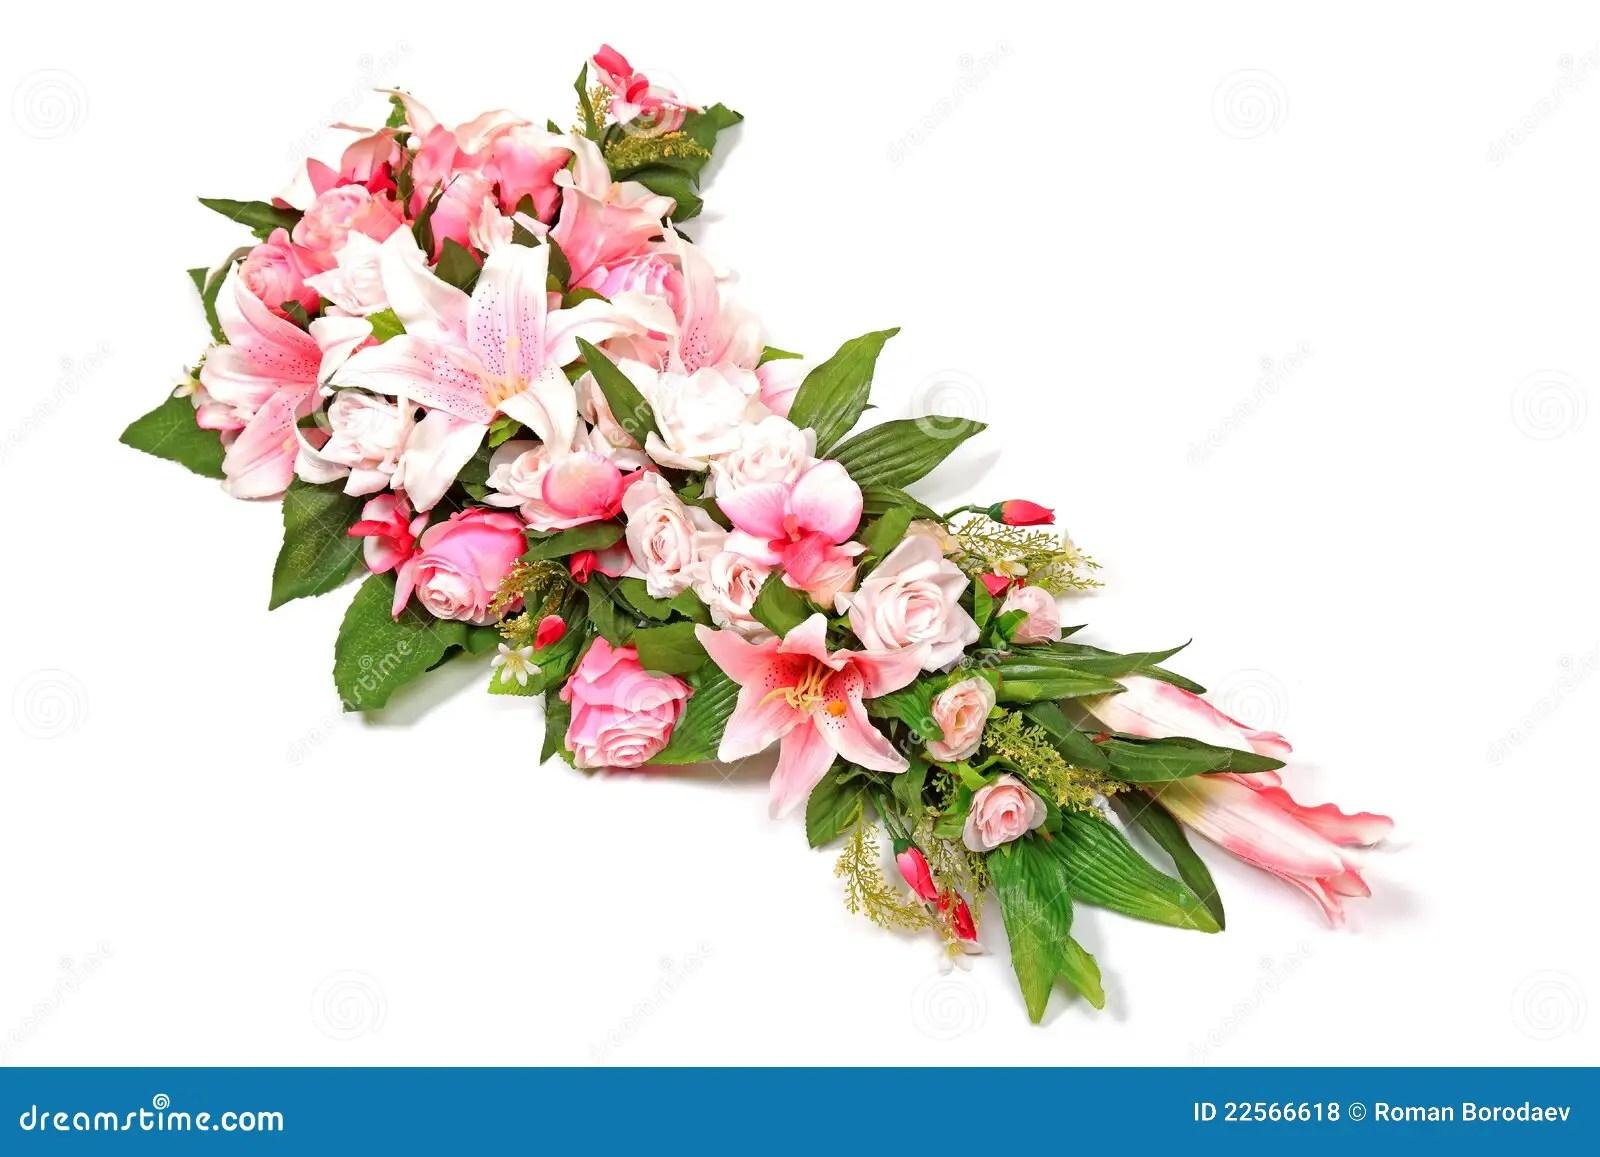 Wedding Flower Composition Studio Shot. Stock Photo